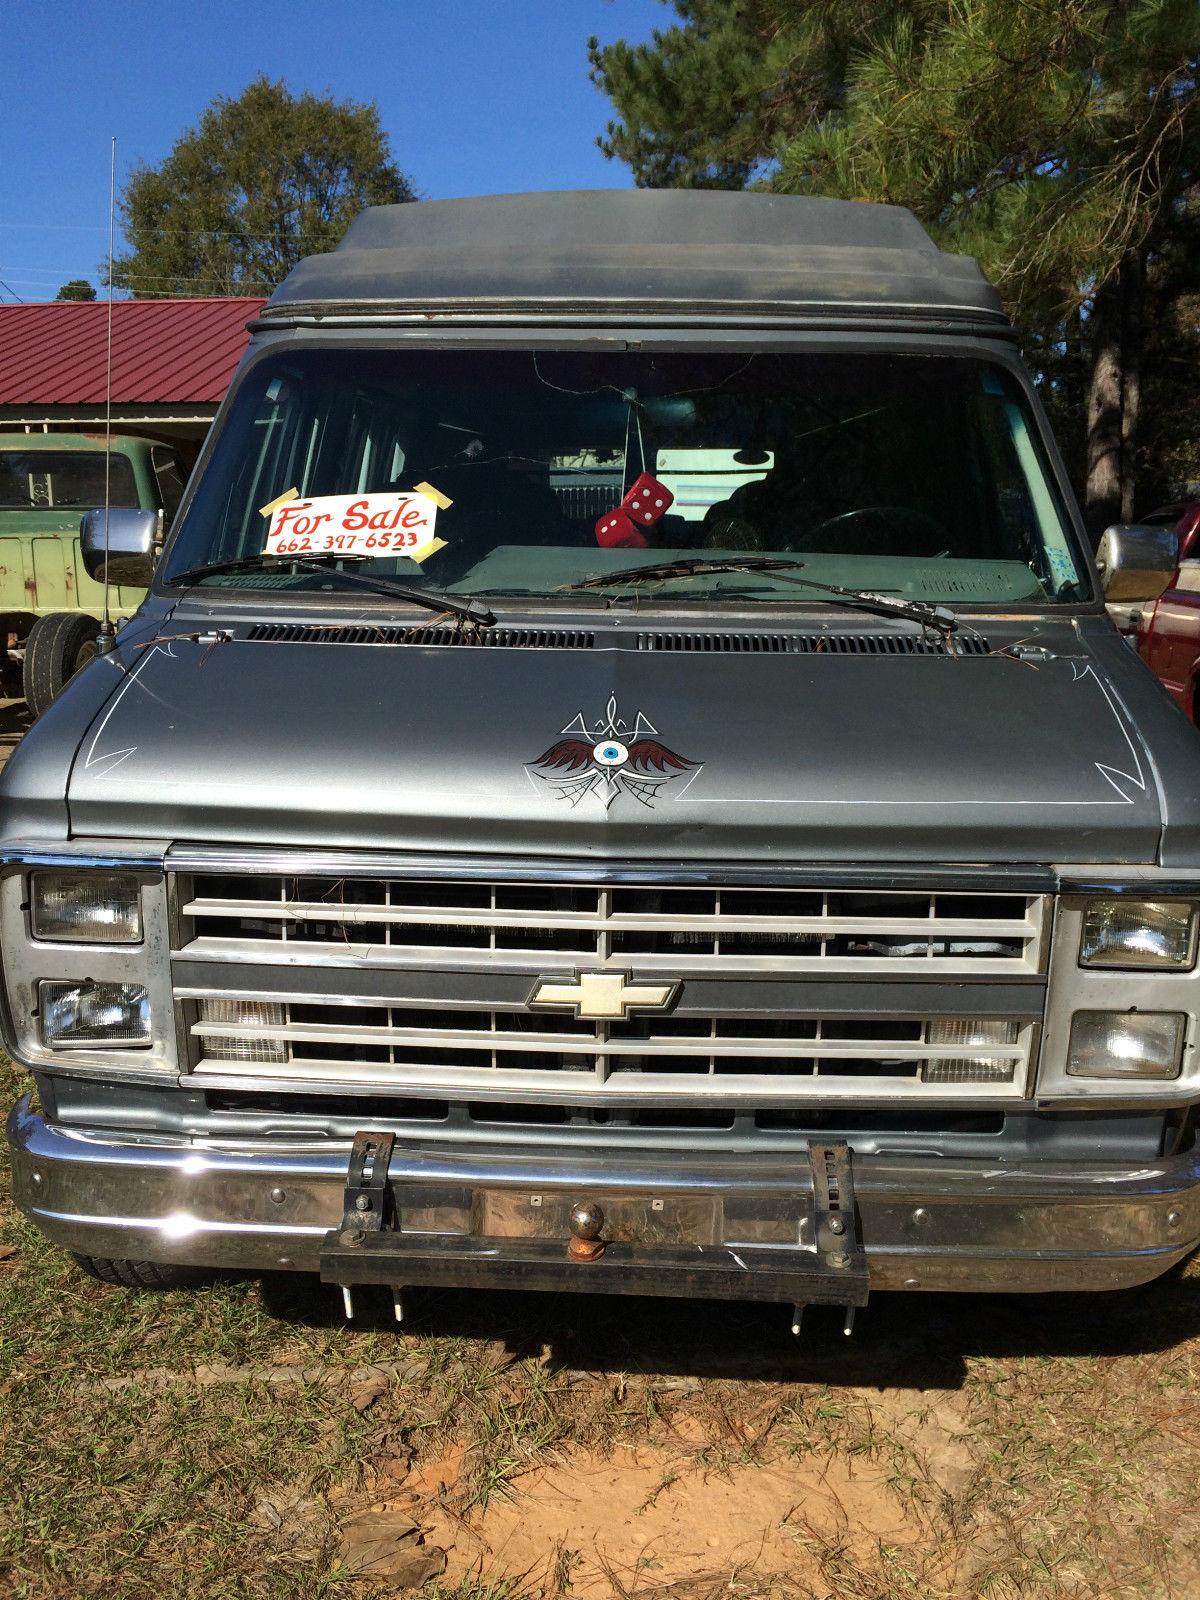 Chevy Jayco Conversion Van